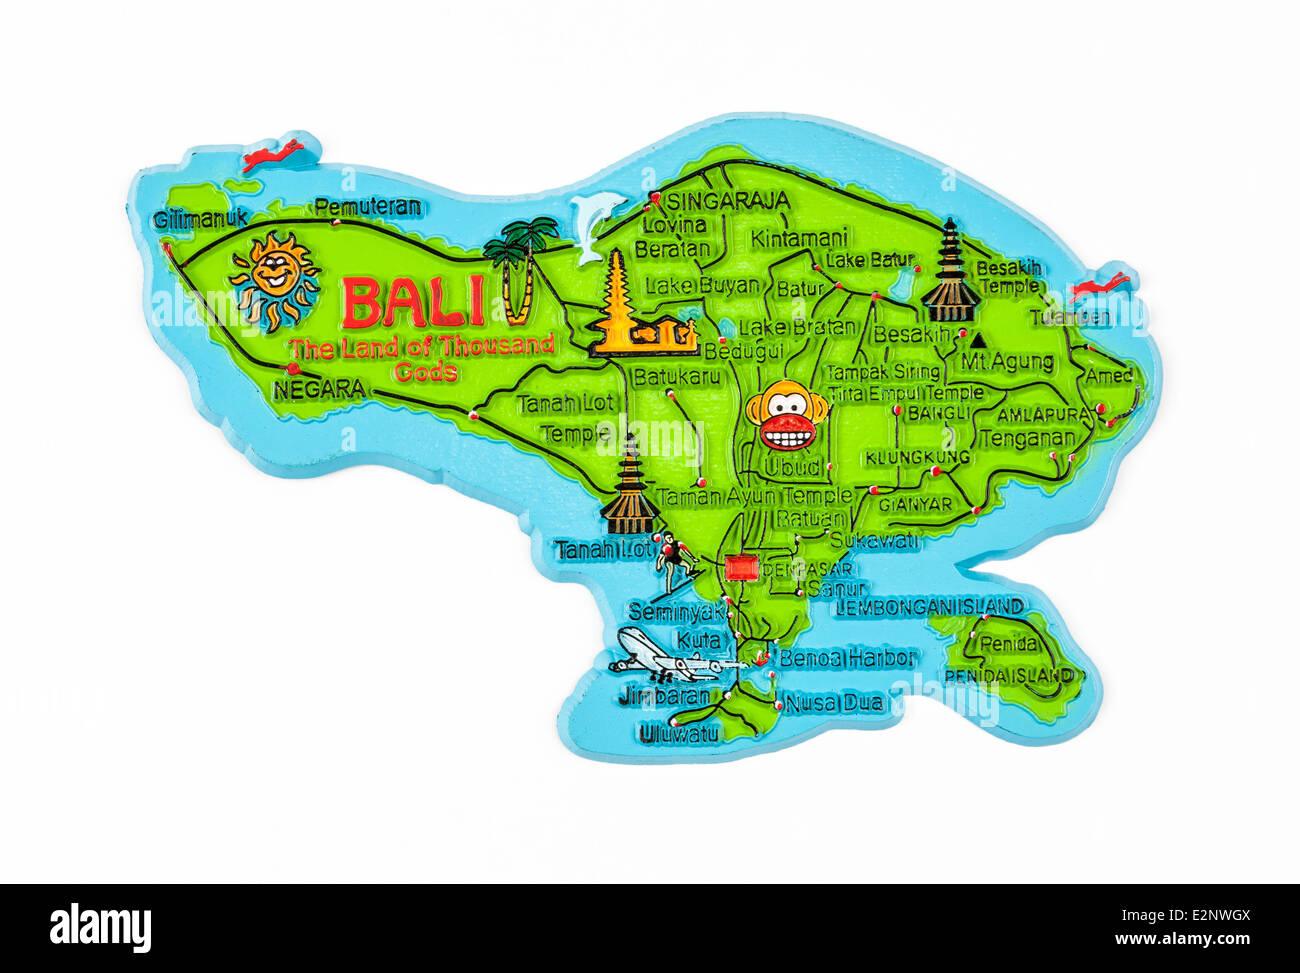 Cartina Bali Indonesia.Bali Map High Resolution Stock Photography And Images Alamy